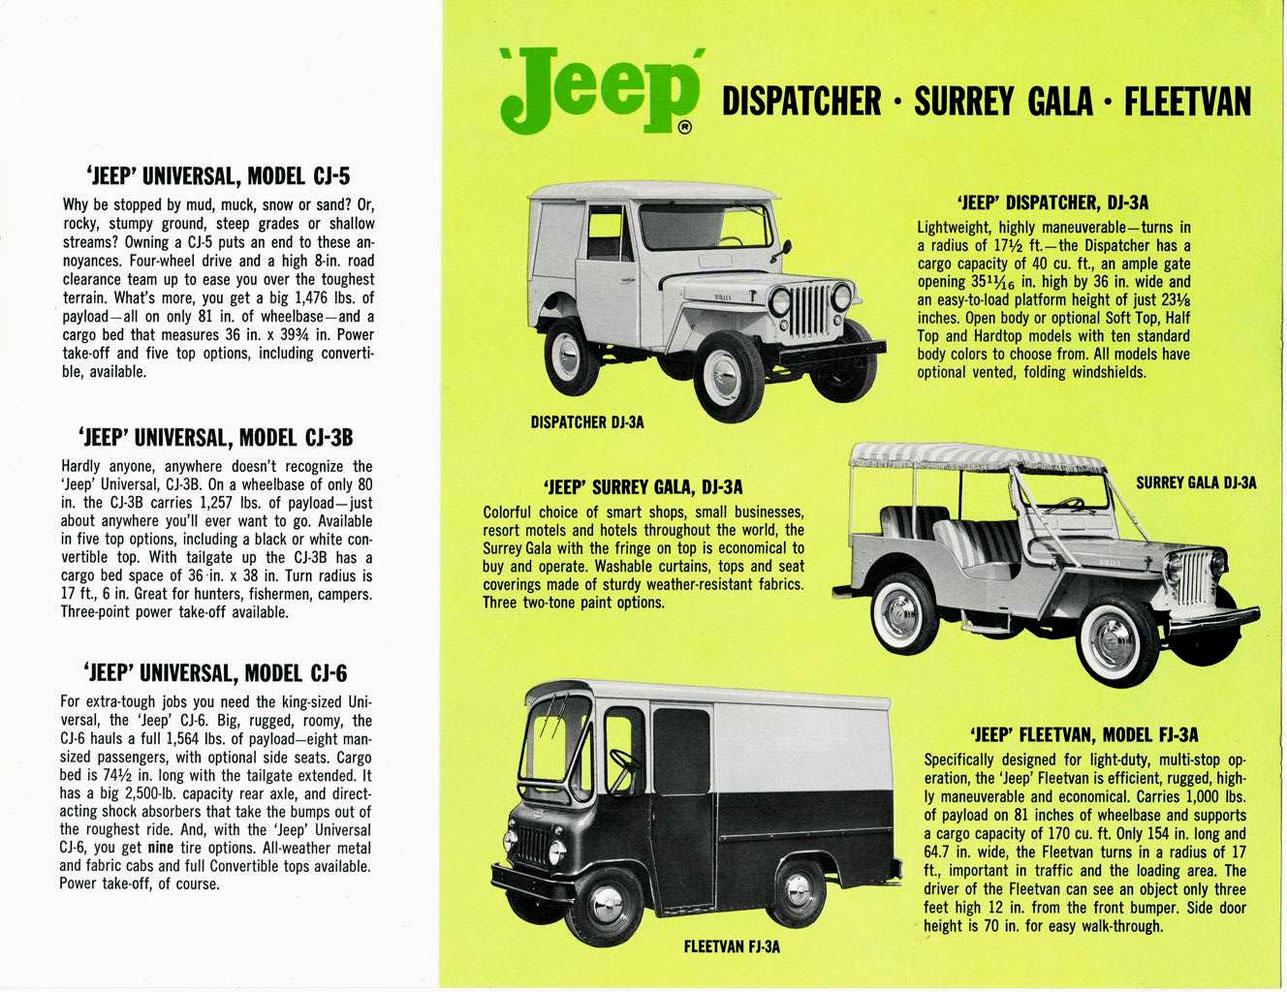 2 Jeep jeep jeep no